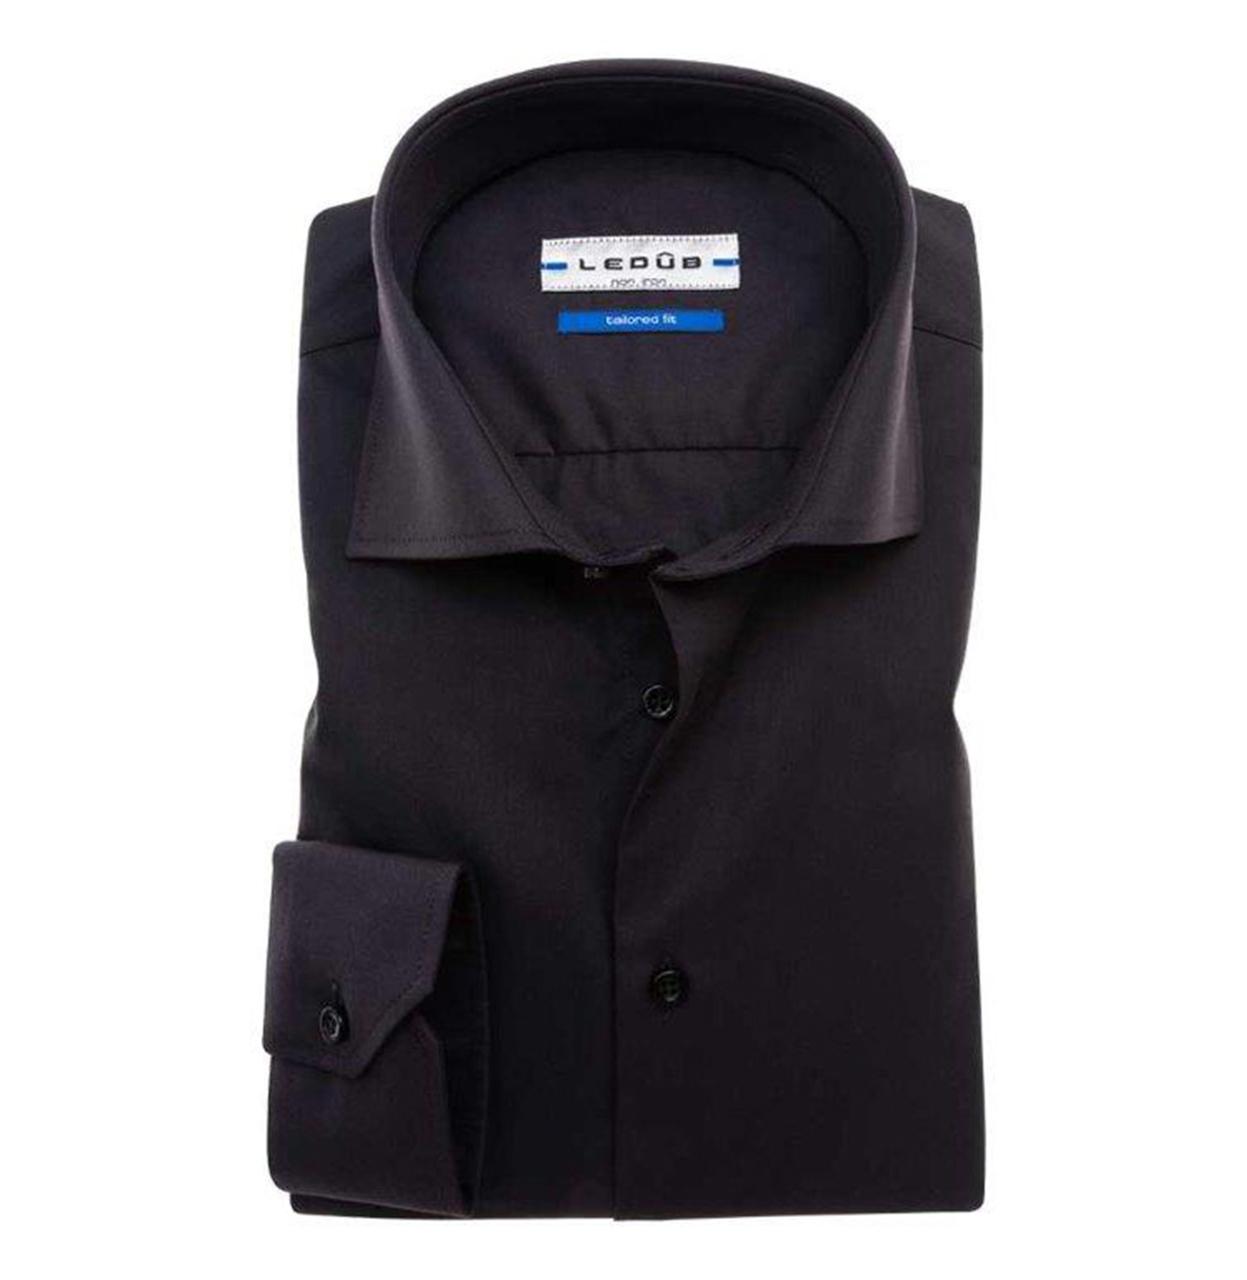 Ledub Shirt 0033528 290000 Zwart 290 0033528 zwart Maat 38